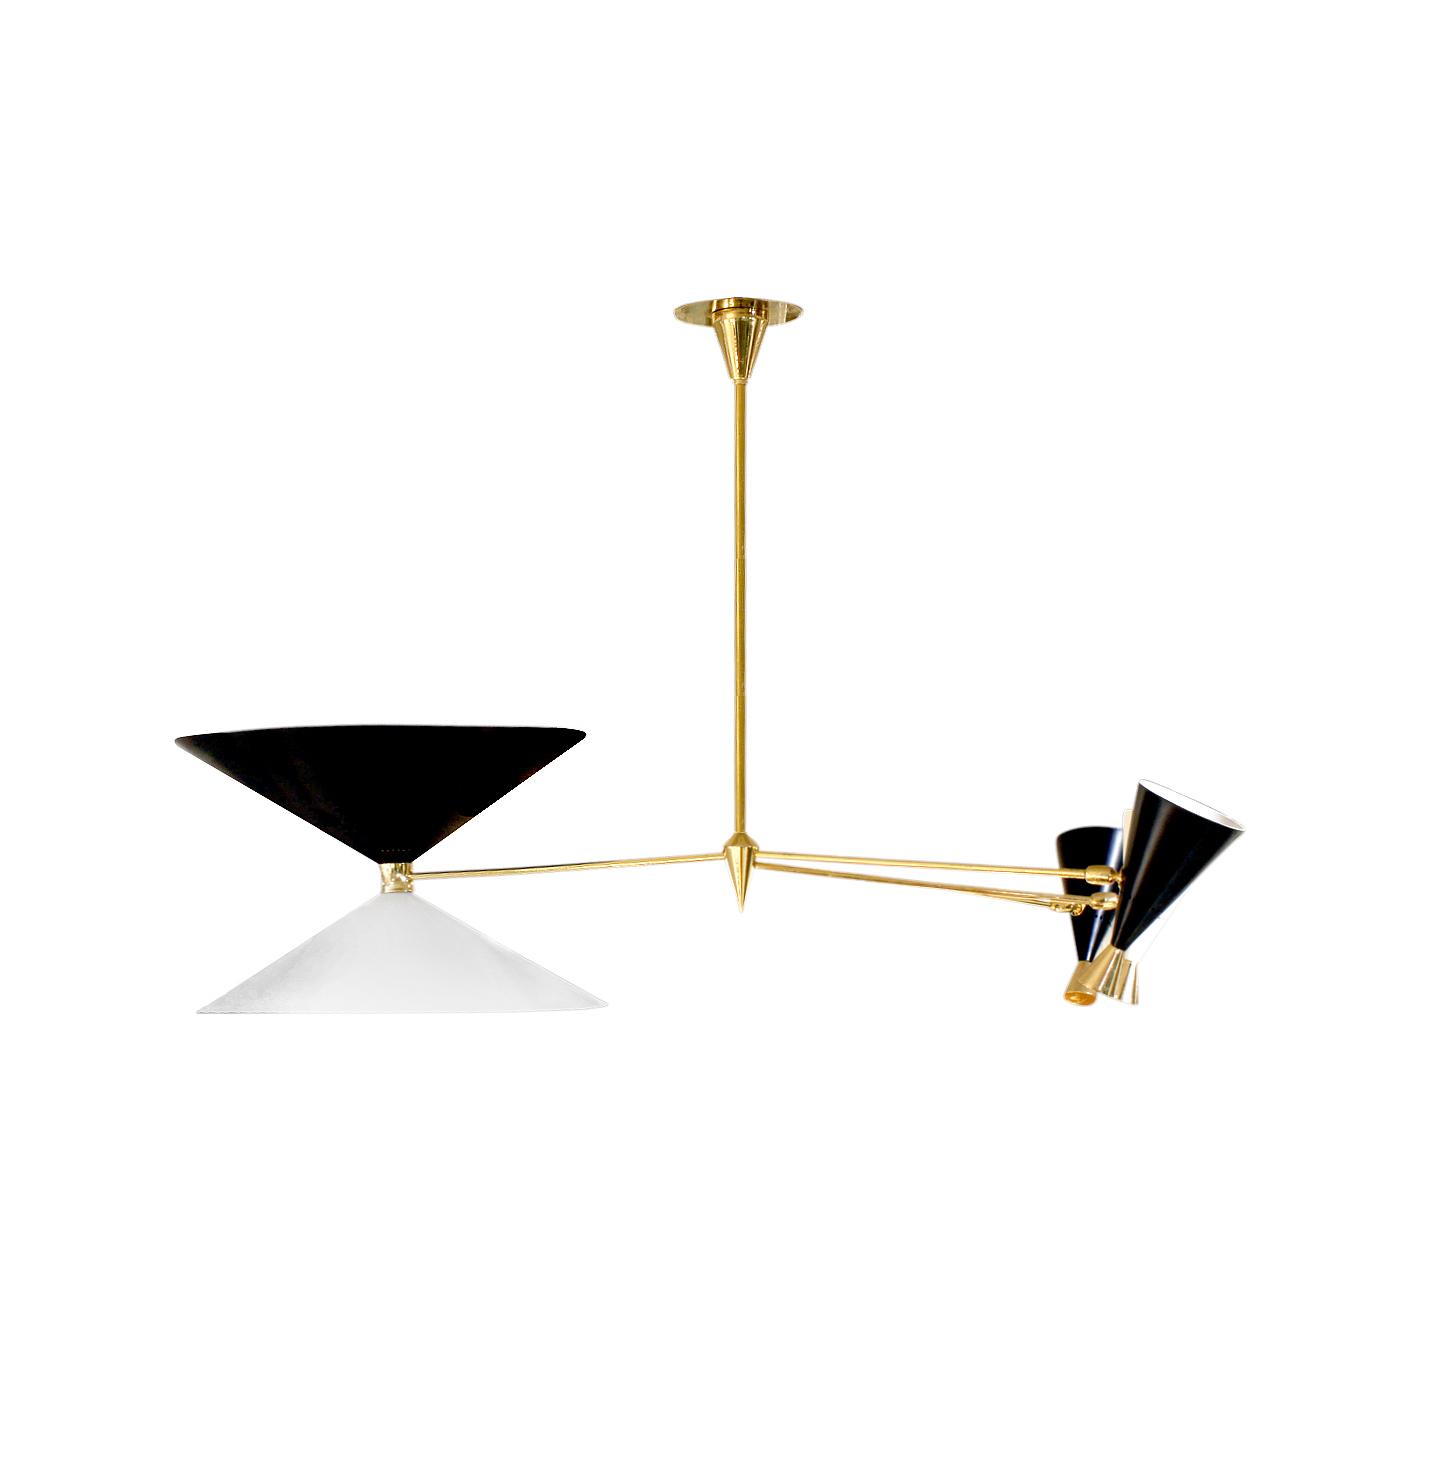 Arredoluce 300 3 sml cones chandelier234 main.jpg